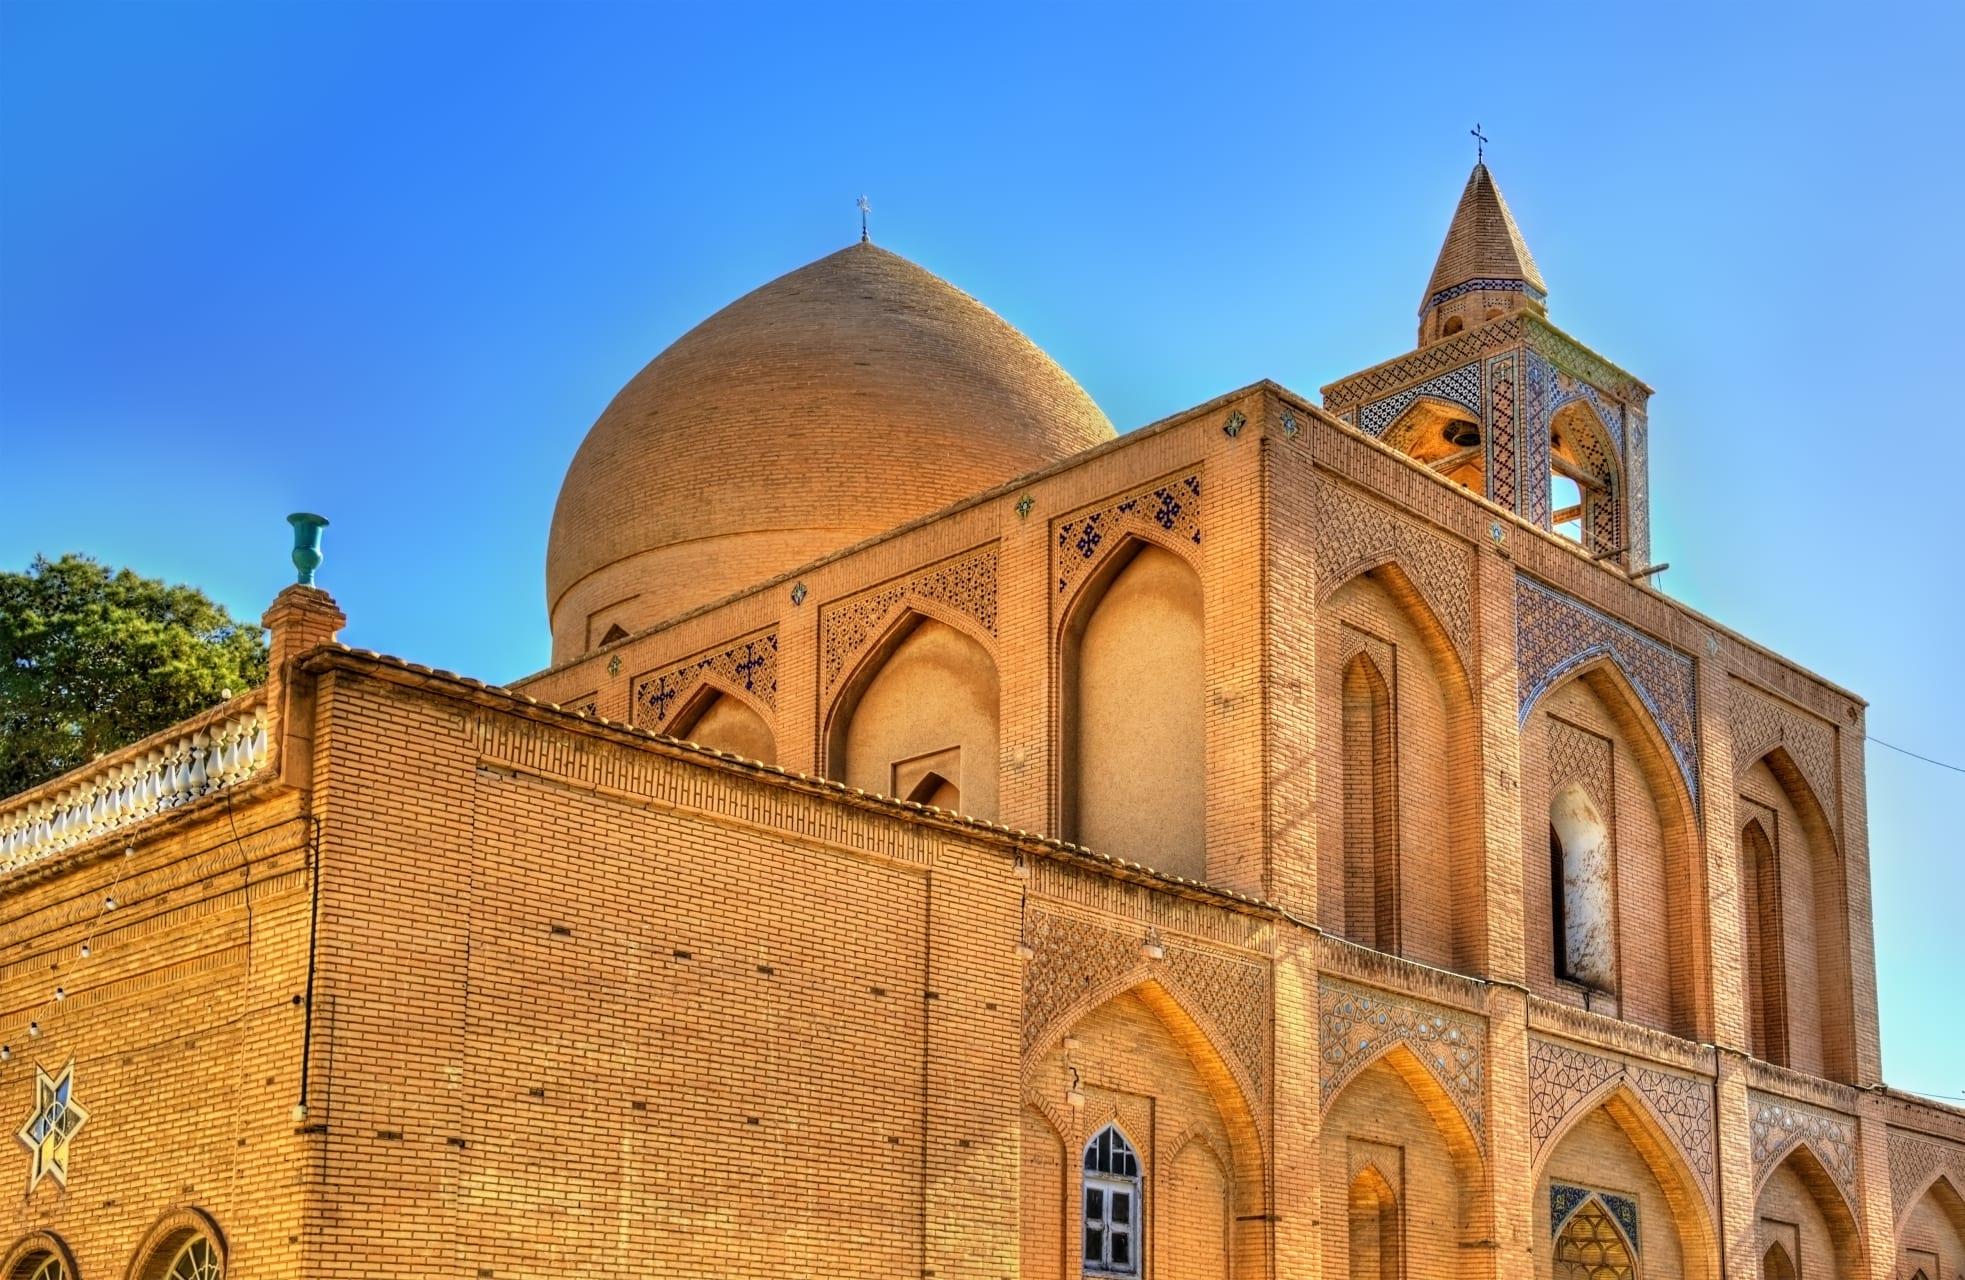 Ispahan - Armenian Cathedral in Isfahan: Vank